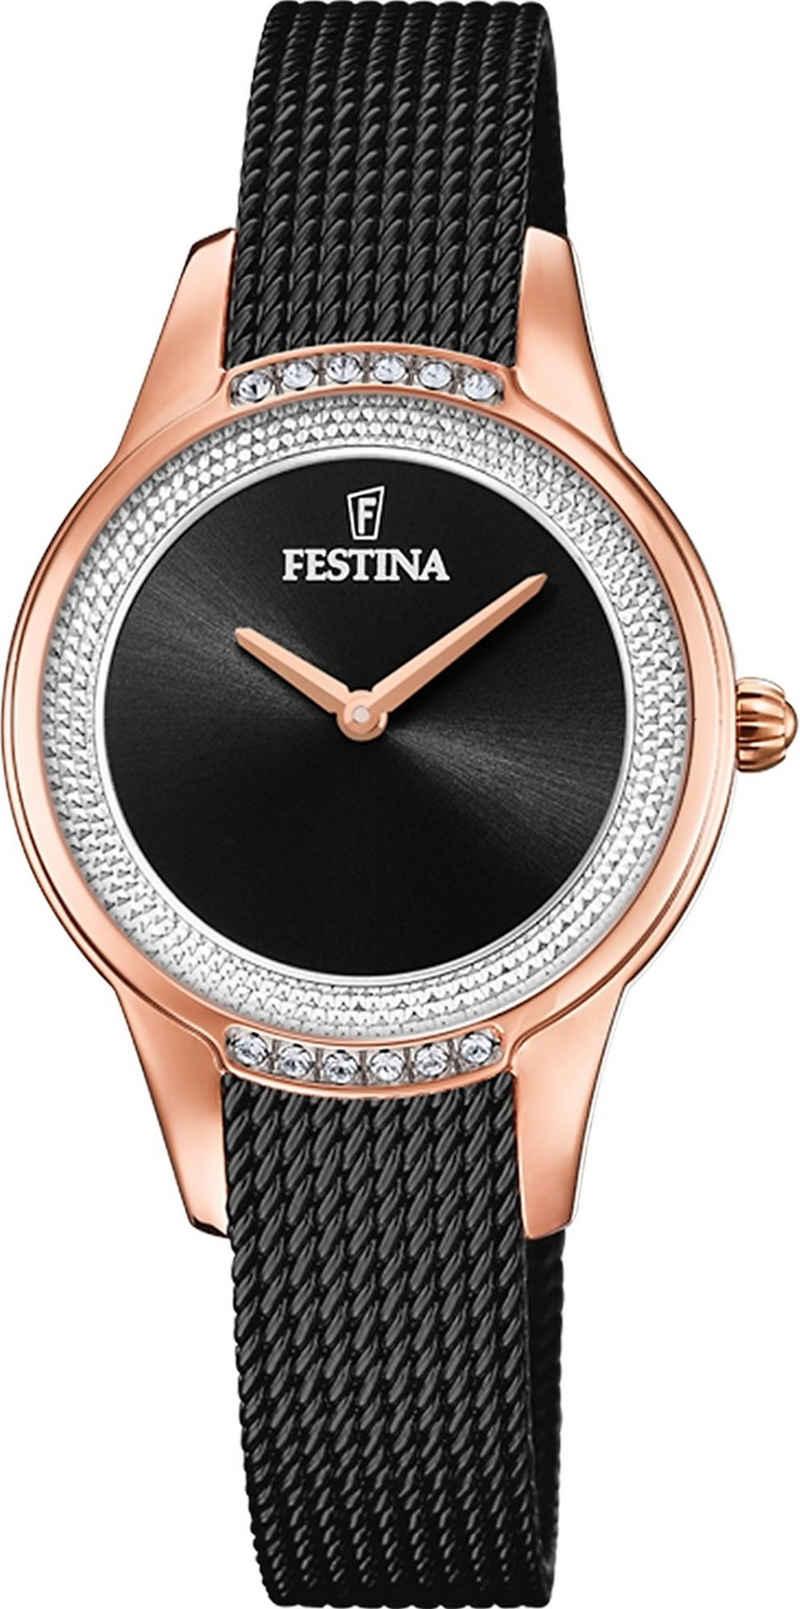 Festina Quarzuhr »UF20496/2 Festina Damen Uhr F20496/2 Edelstahlband«, (Analoguhr), Damen Armbanduhr rund, Edelstahlarmband schwarz, Elegant